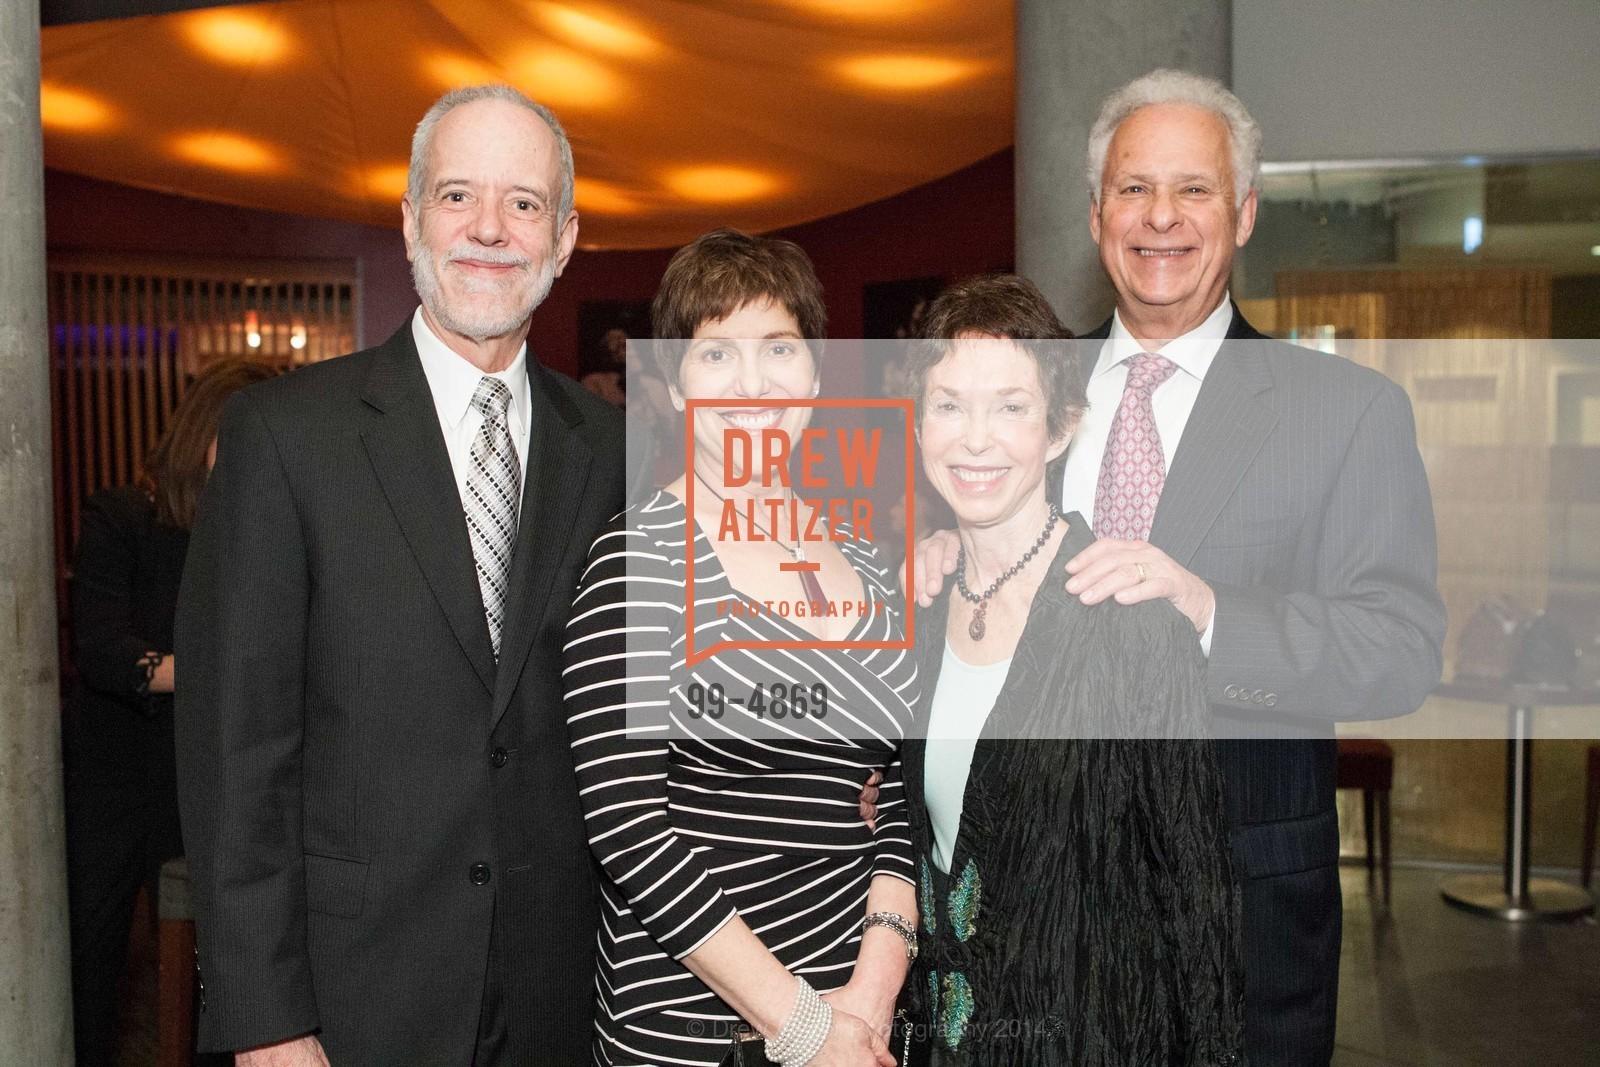 Bill Podger, Beth Podger, Susan Fisch, Ed Fisch, Photo #99-4869